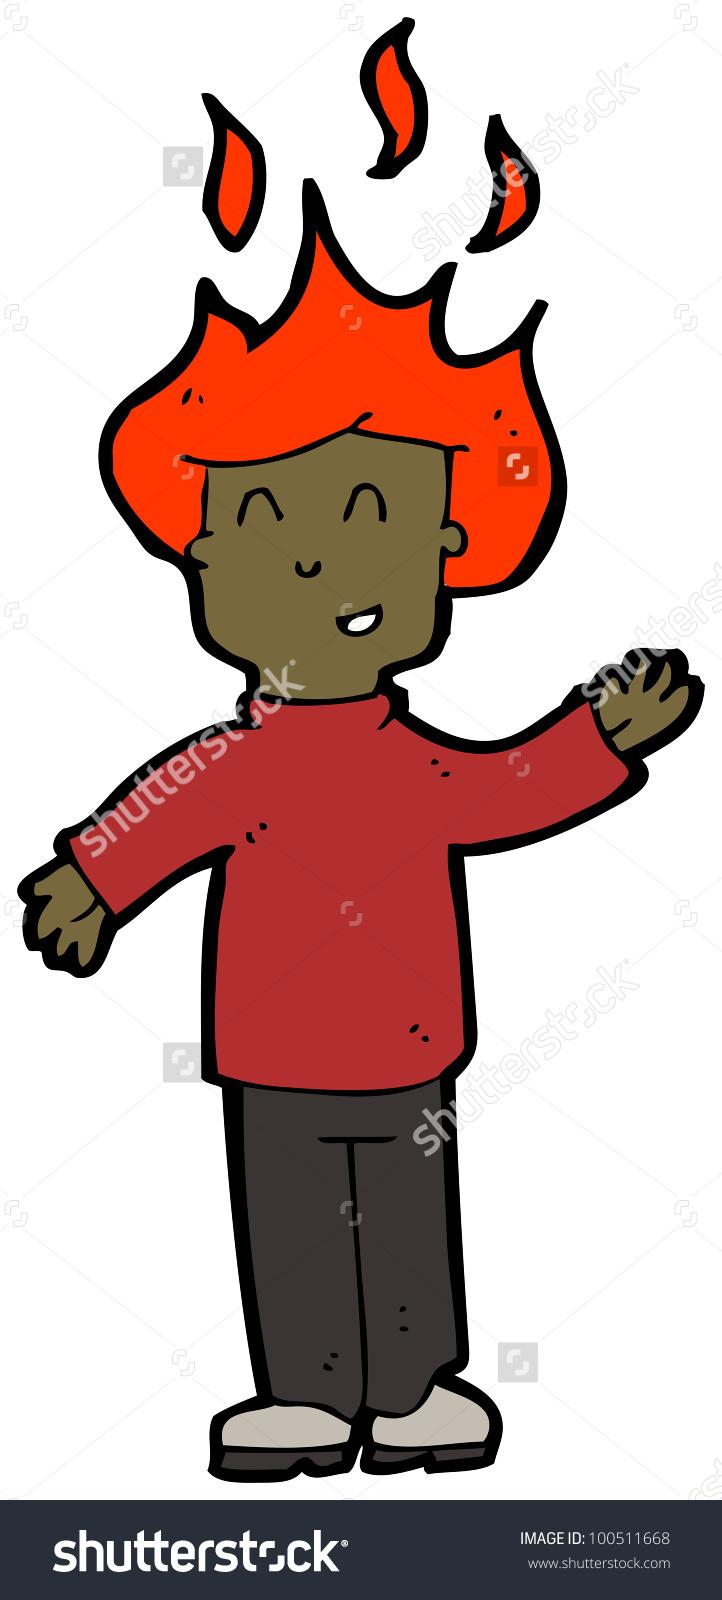 Cartoon Man With Burning Hair Stock Photo 100511668 : Shutterstock.